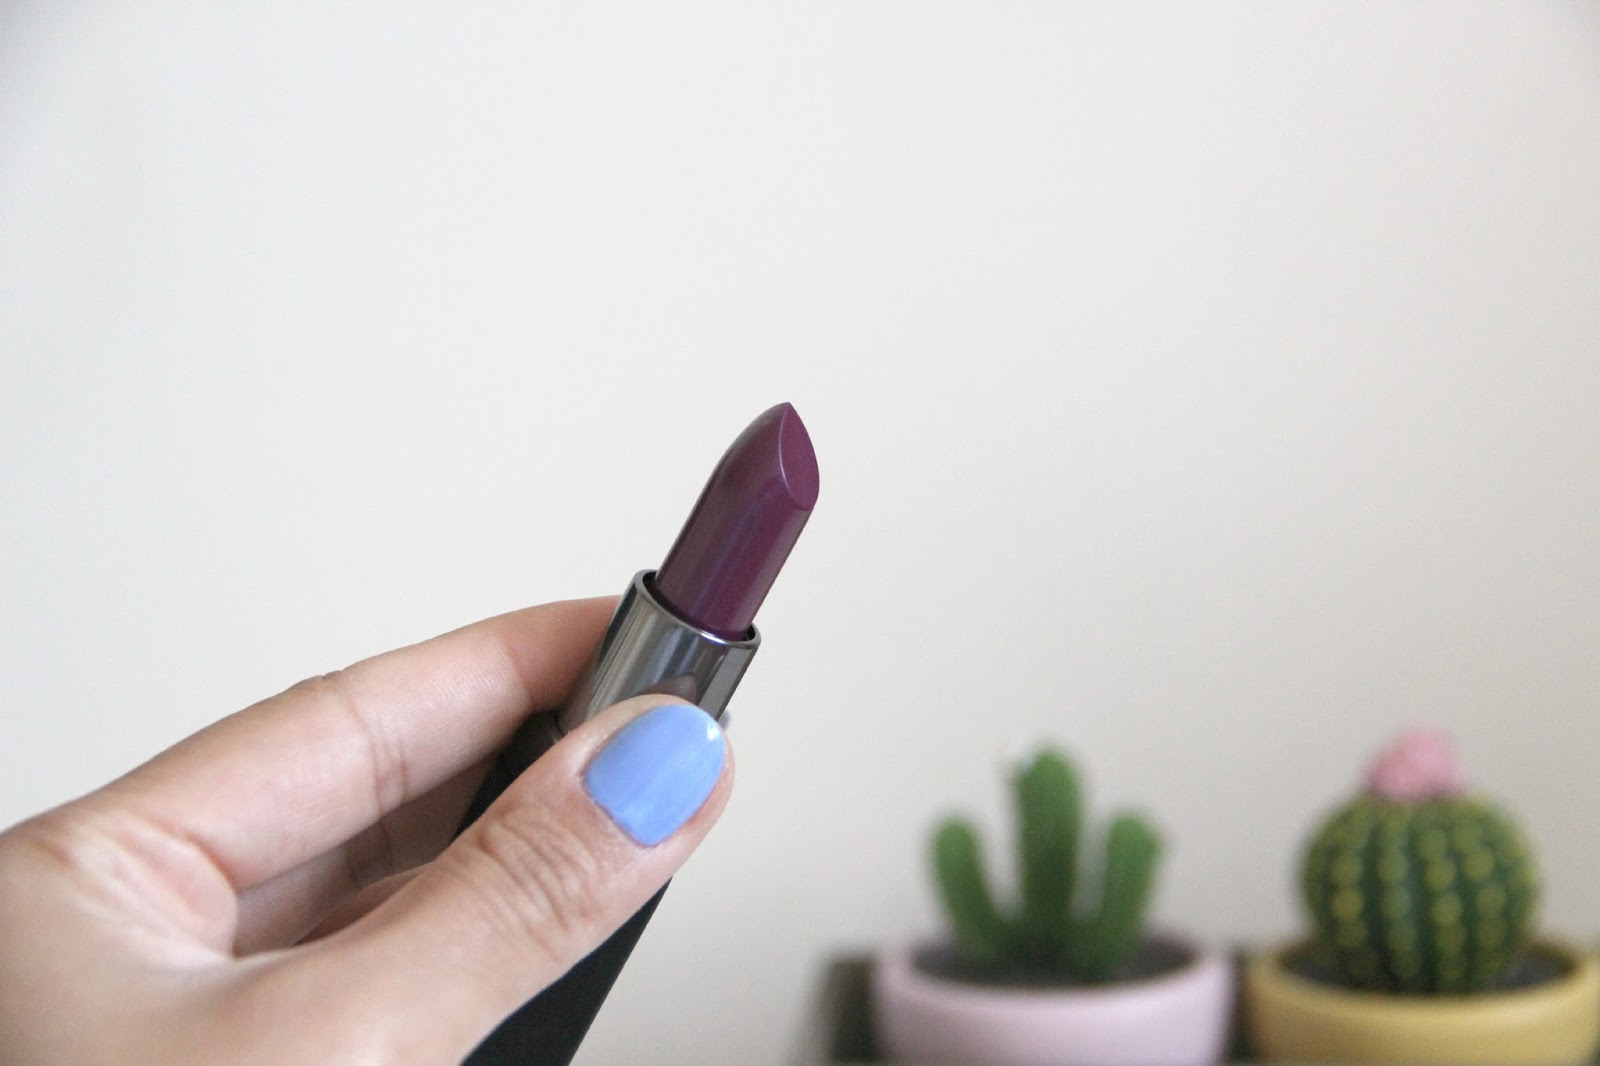 uk beauty blogger, smash box lipstick review, smash box lipstick vivid violet